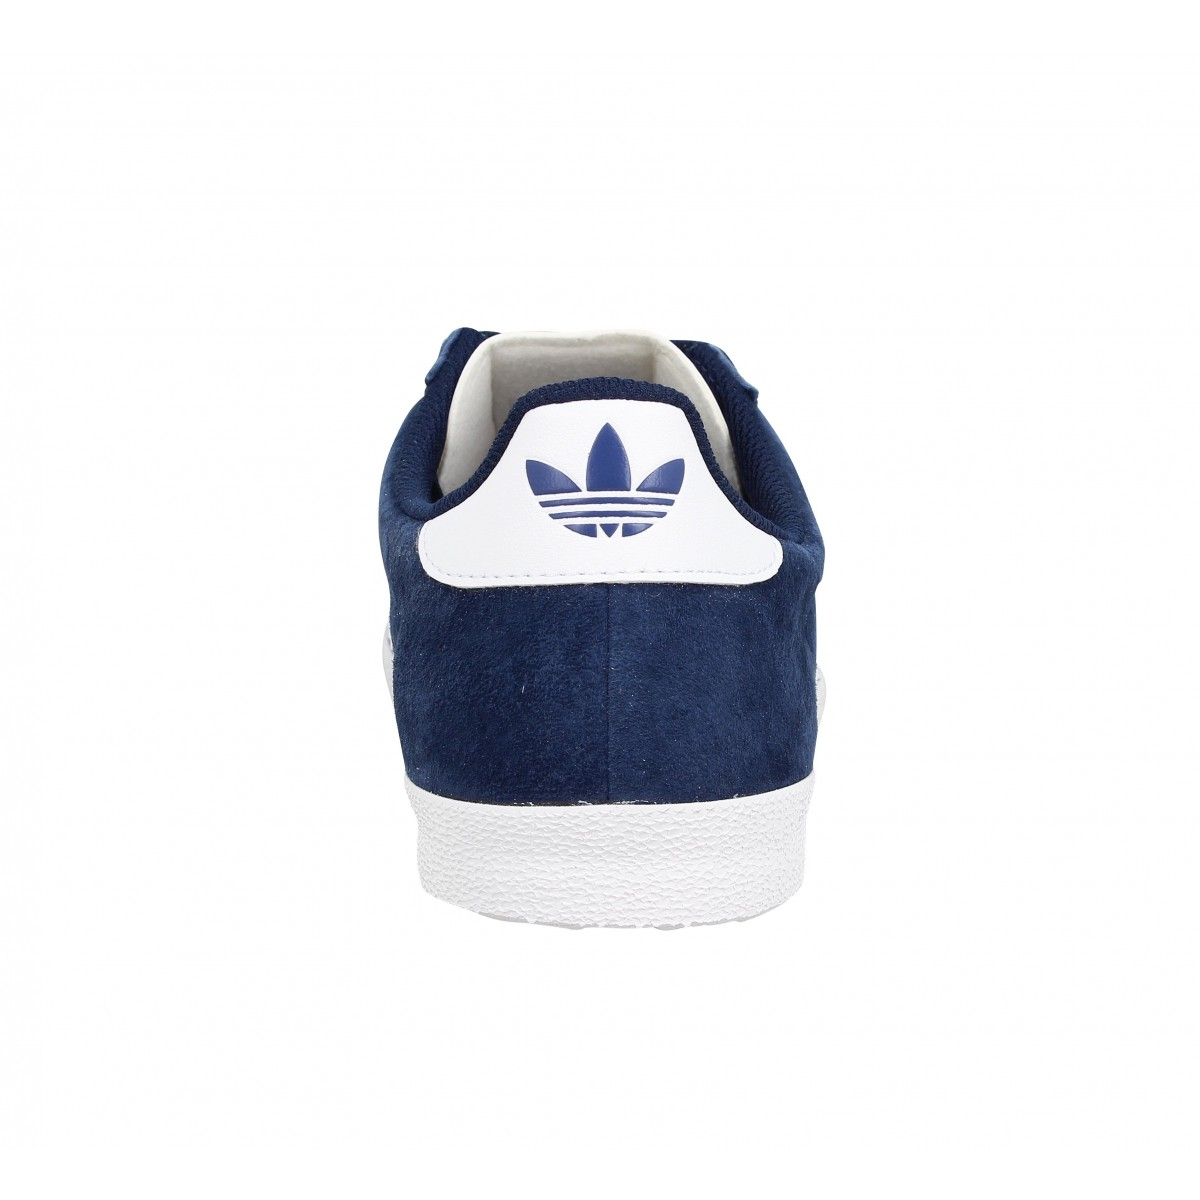 Adidas Gazelle Velours Homme